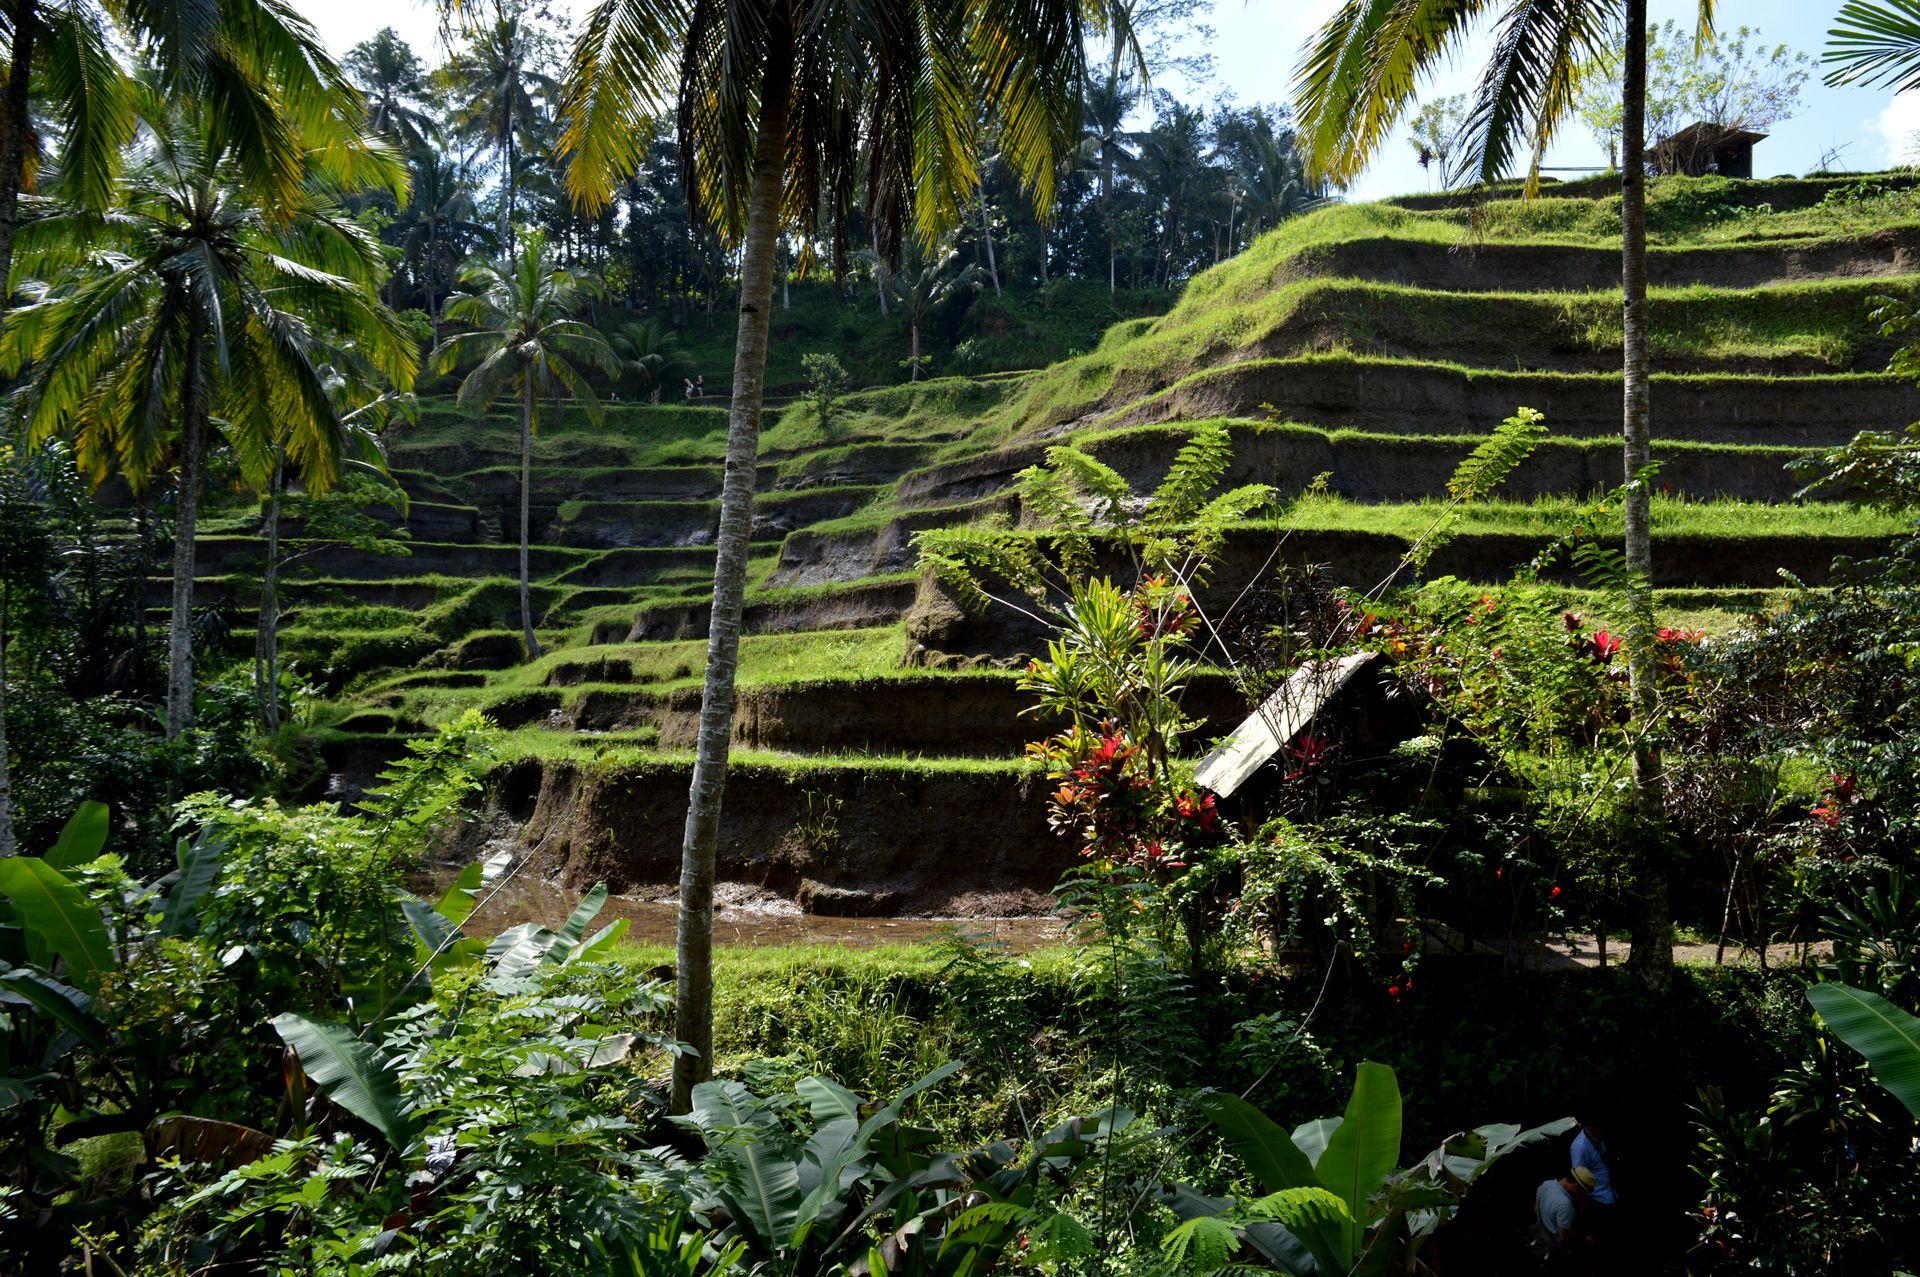 Tegelalang rice terrace in Bali